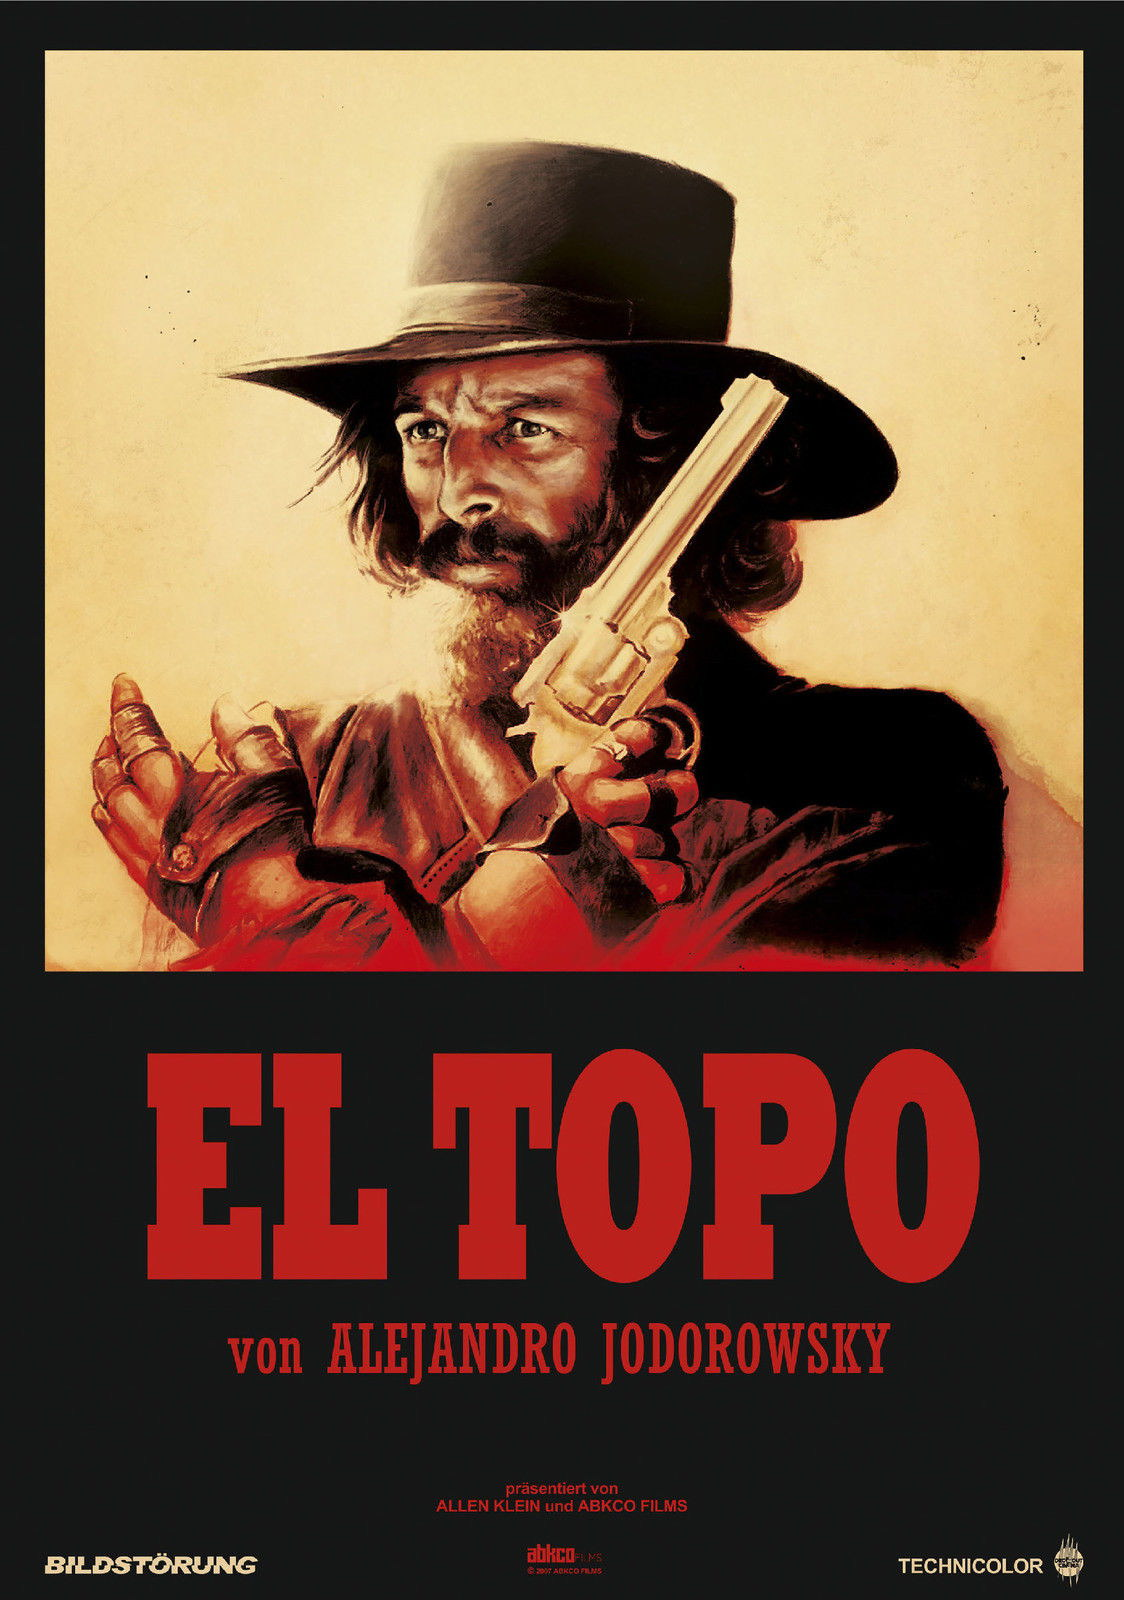 72830-EL-TOPO-European-Version-Alejandro-Jodorowsky-Wall-Print-Poster-Affiche